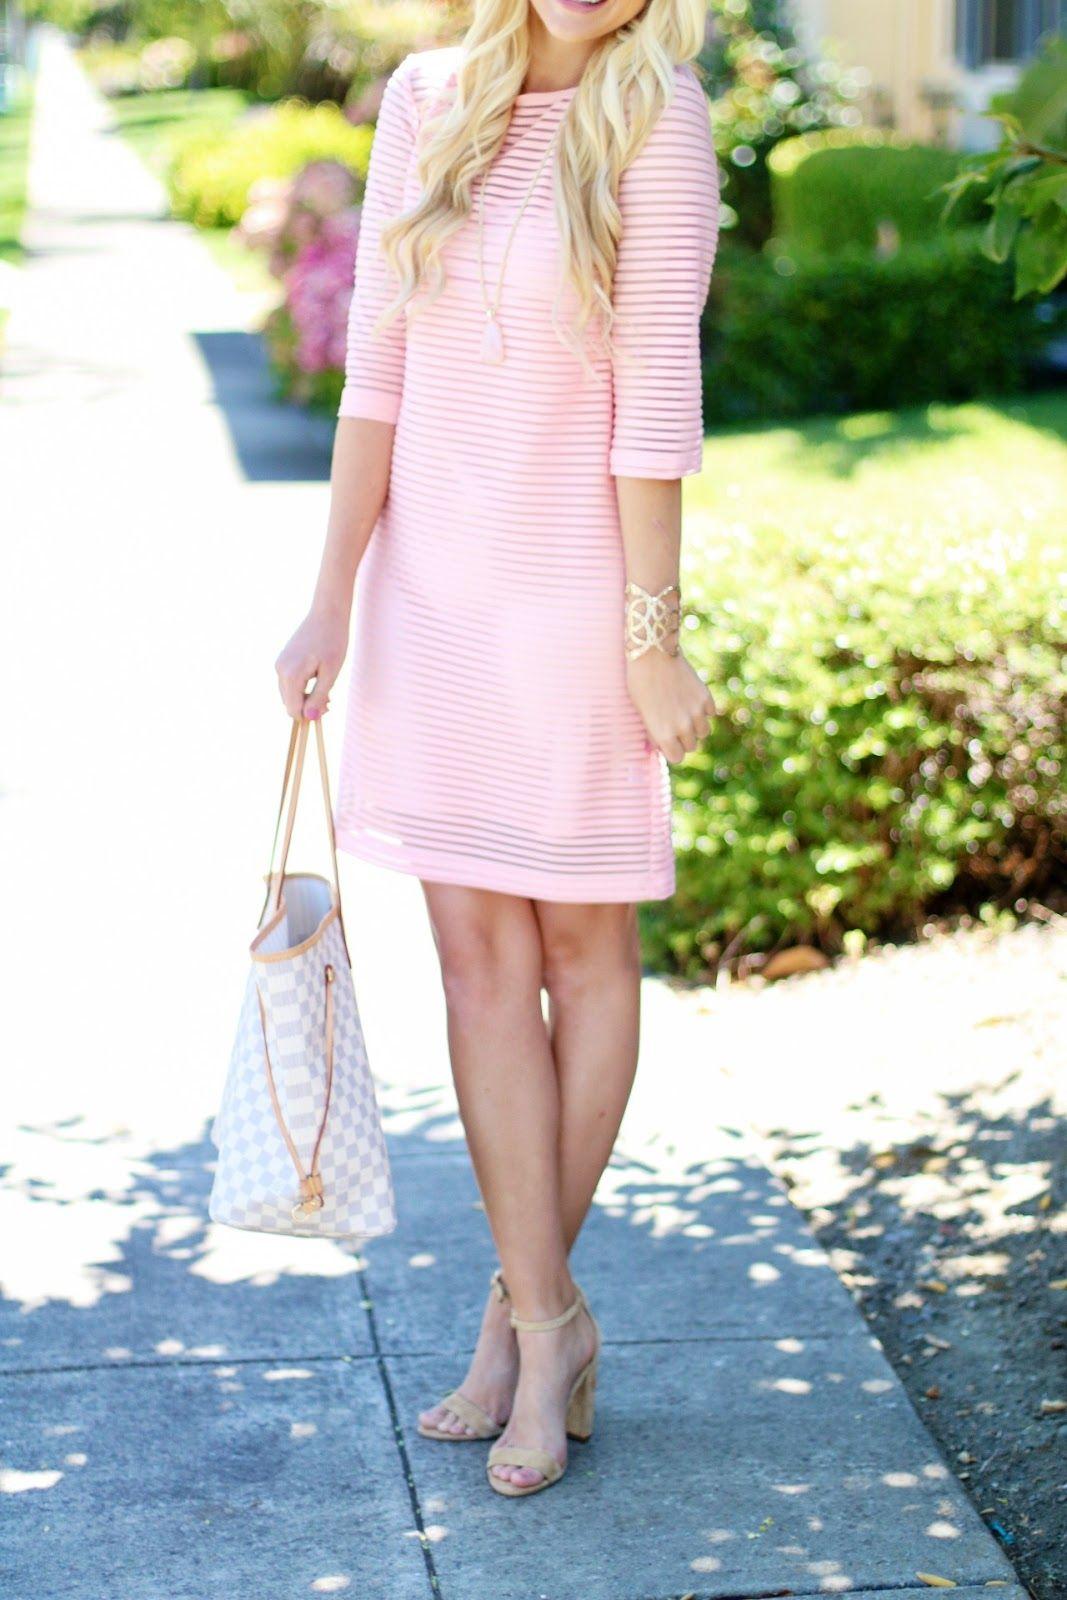 Pink dress shoes for ladies  Pin by Melissa Misseg on DressShoesStyle swimwear